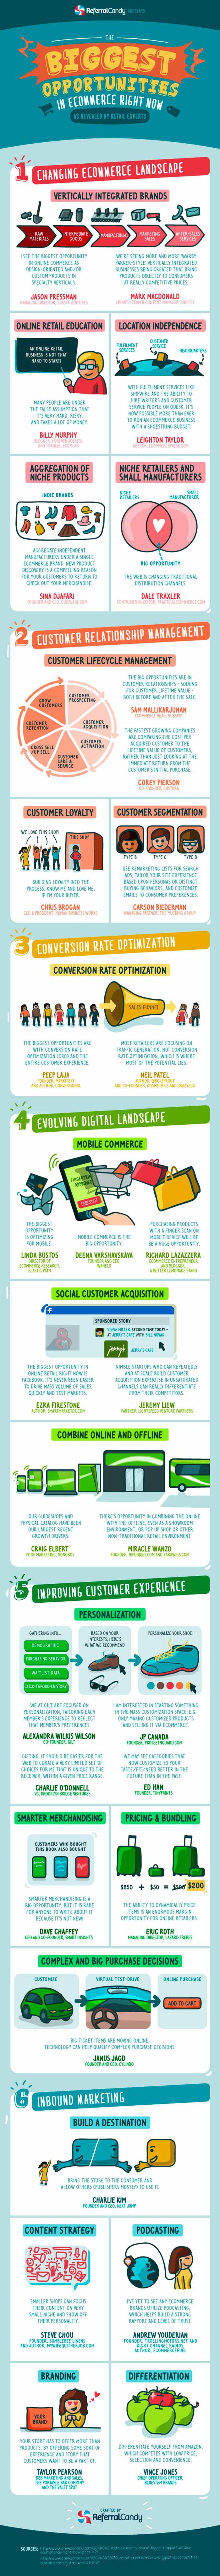 infografia sobre las mayores oportunidades en el ecommerce hoy en dia